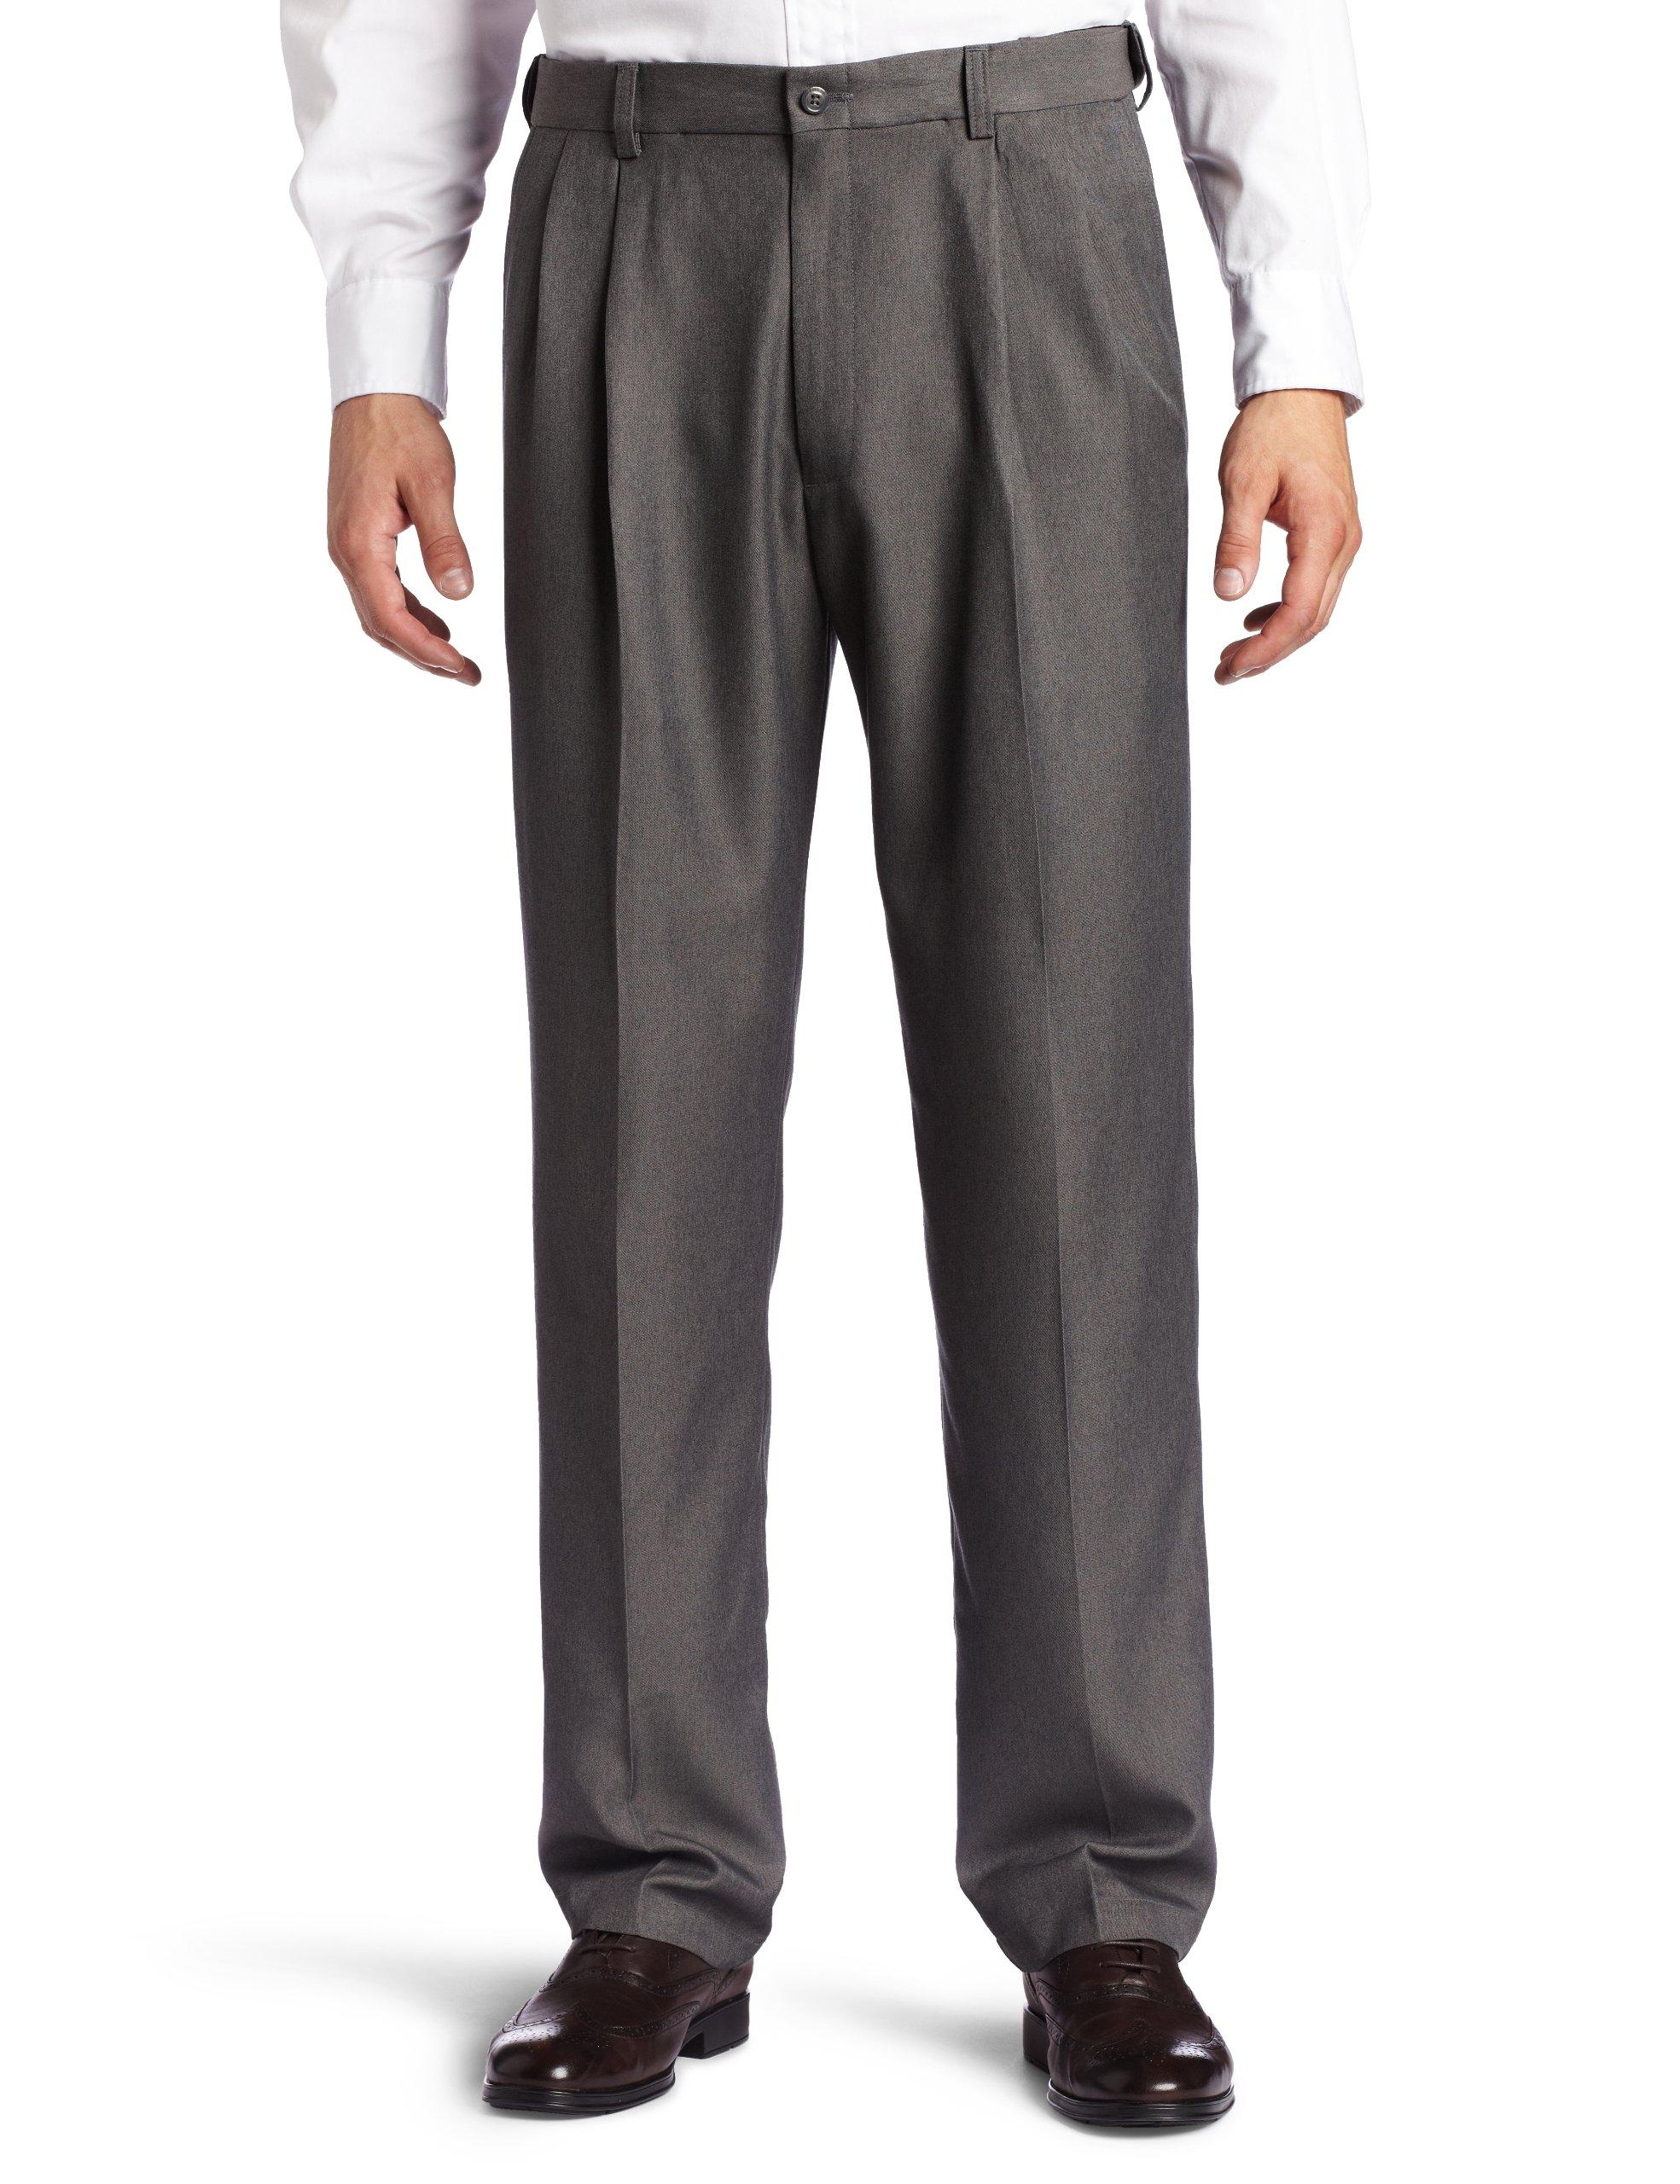 Haggar Men's Big-Tall Cool 18 Gabardine Hidden Expandable Waist Pleat Front Pant, Graphite, 46x30 by Haggar